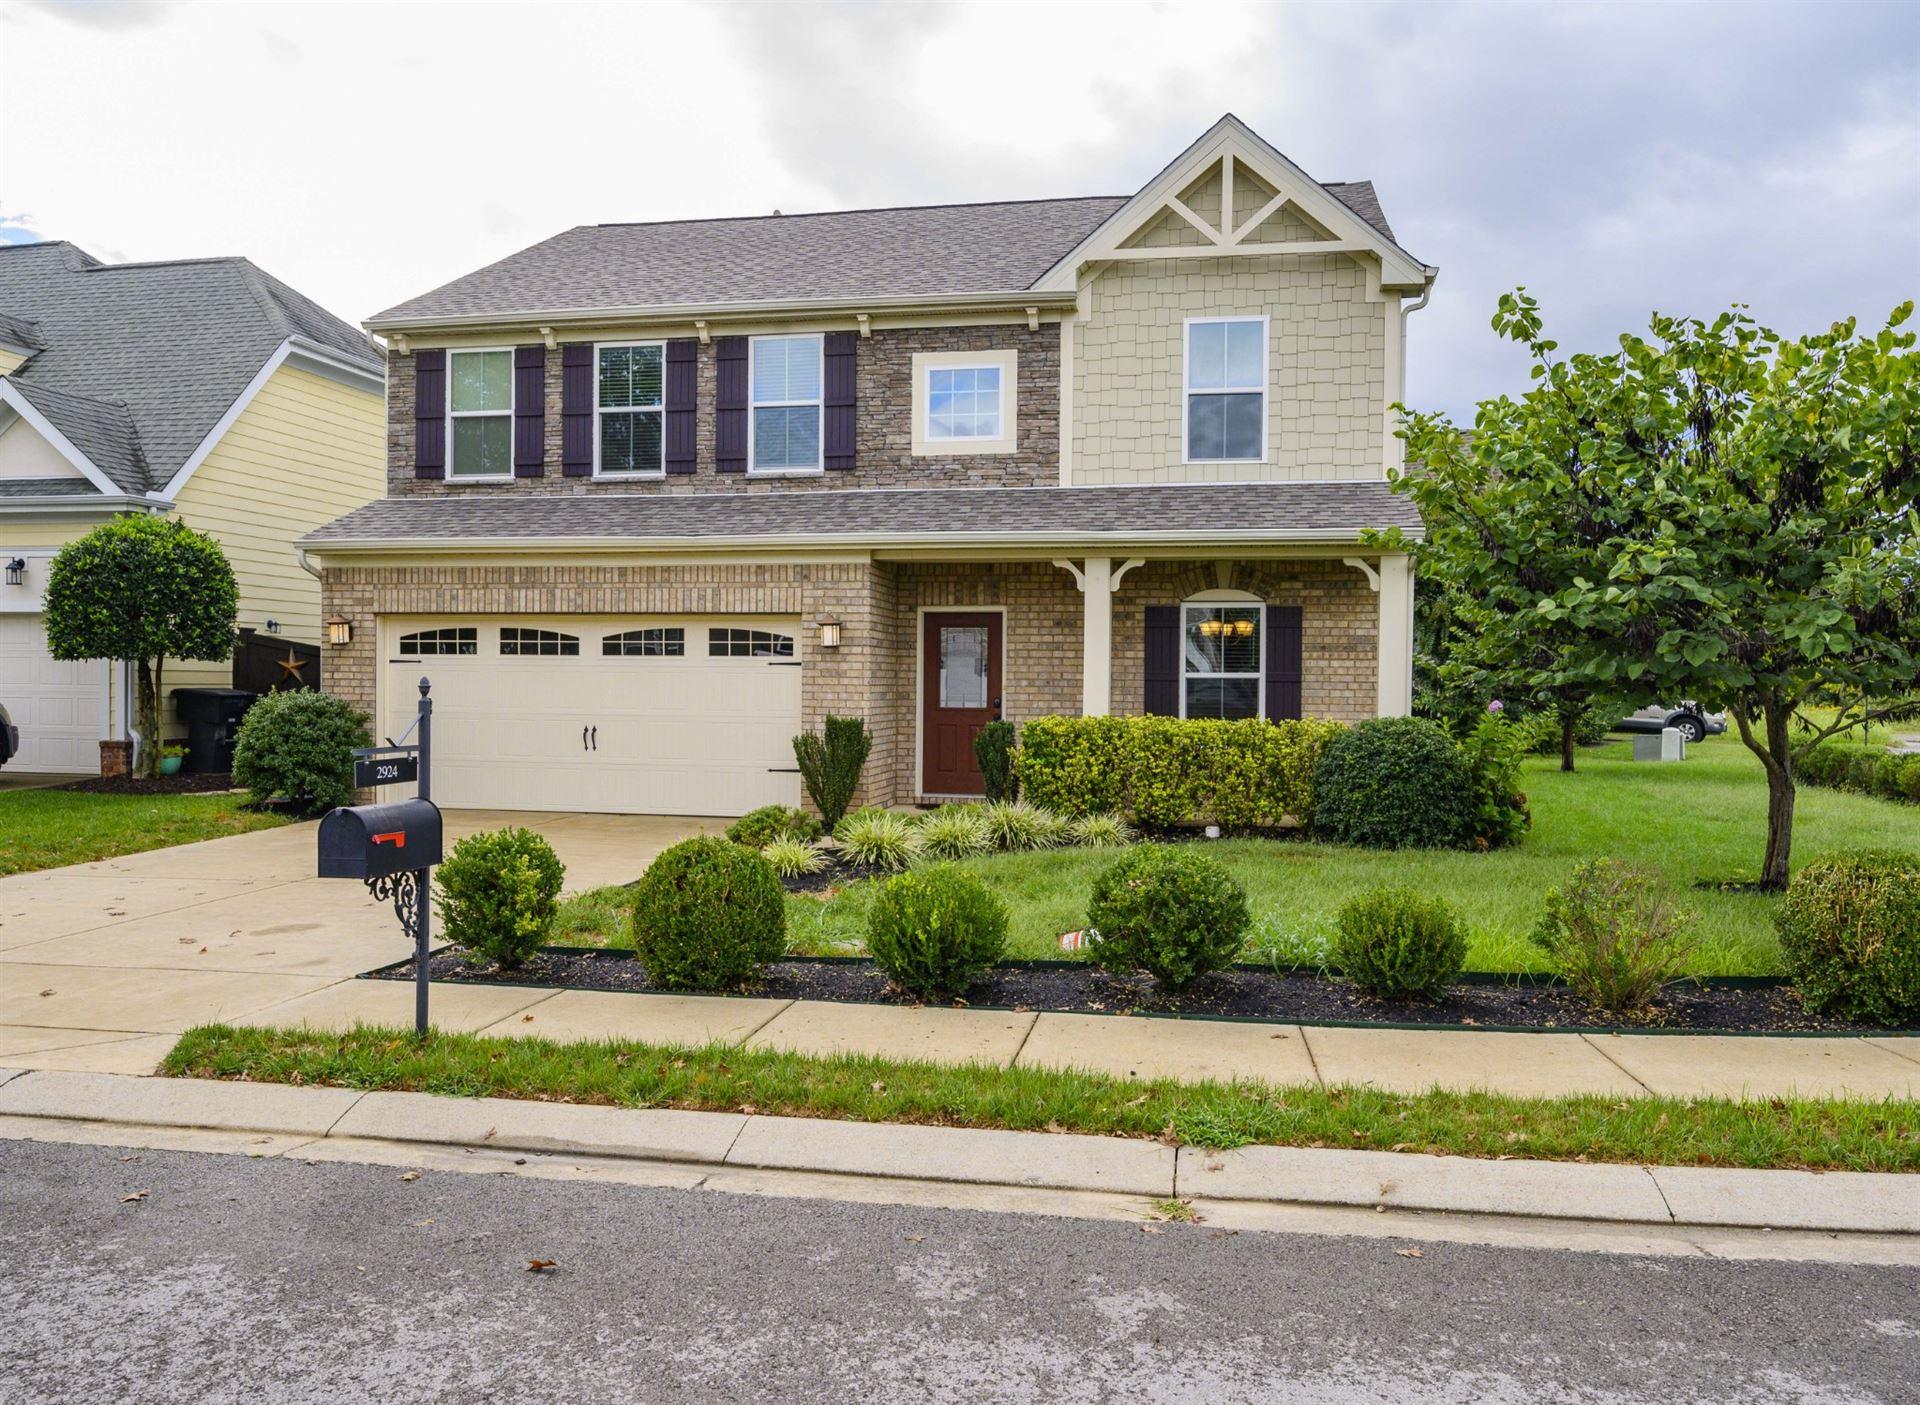 Photo of 2924 Haviland Way, Murfreesboro, TN 37128 (MLS # 2291898)